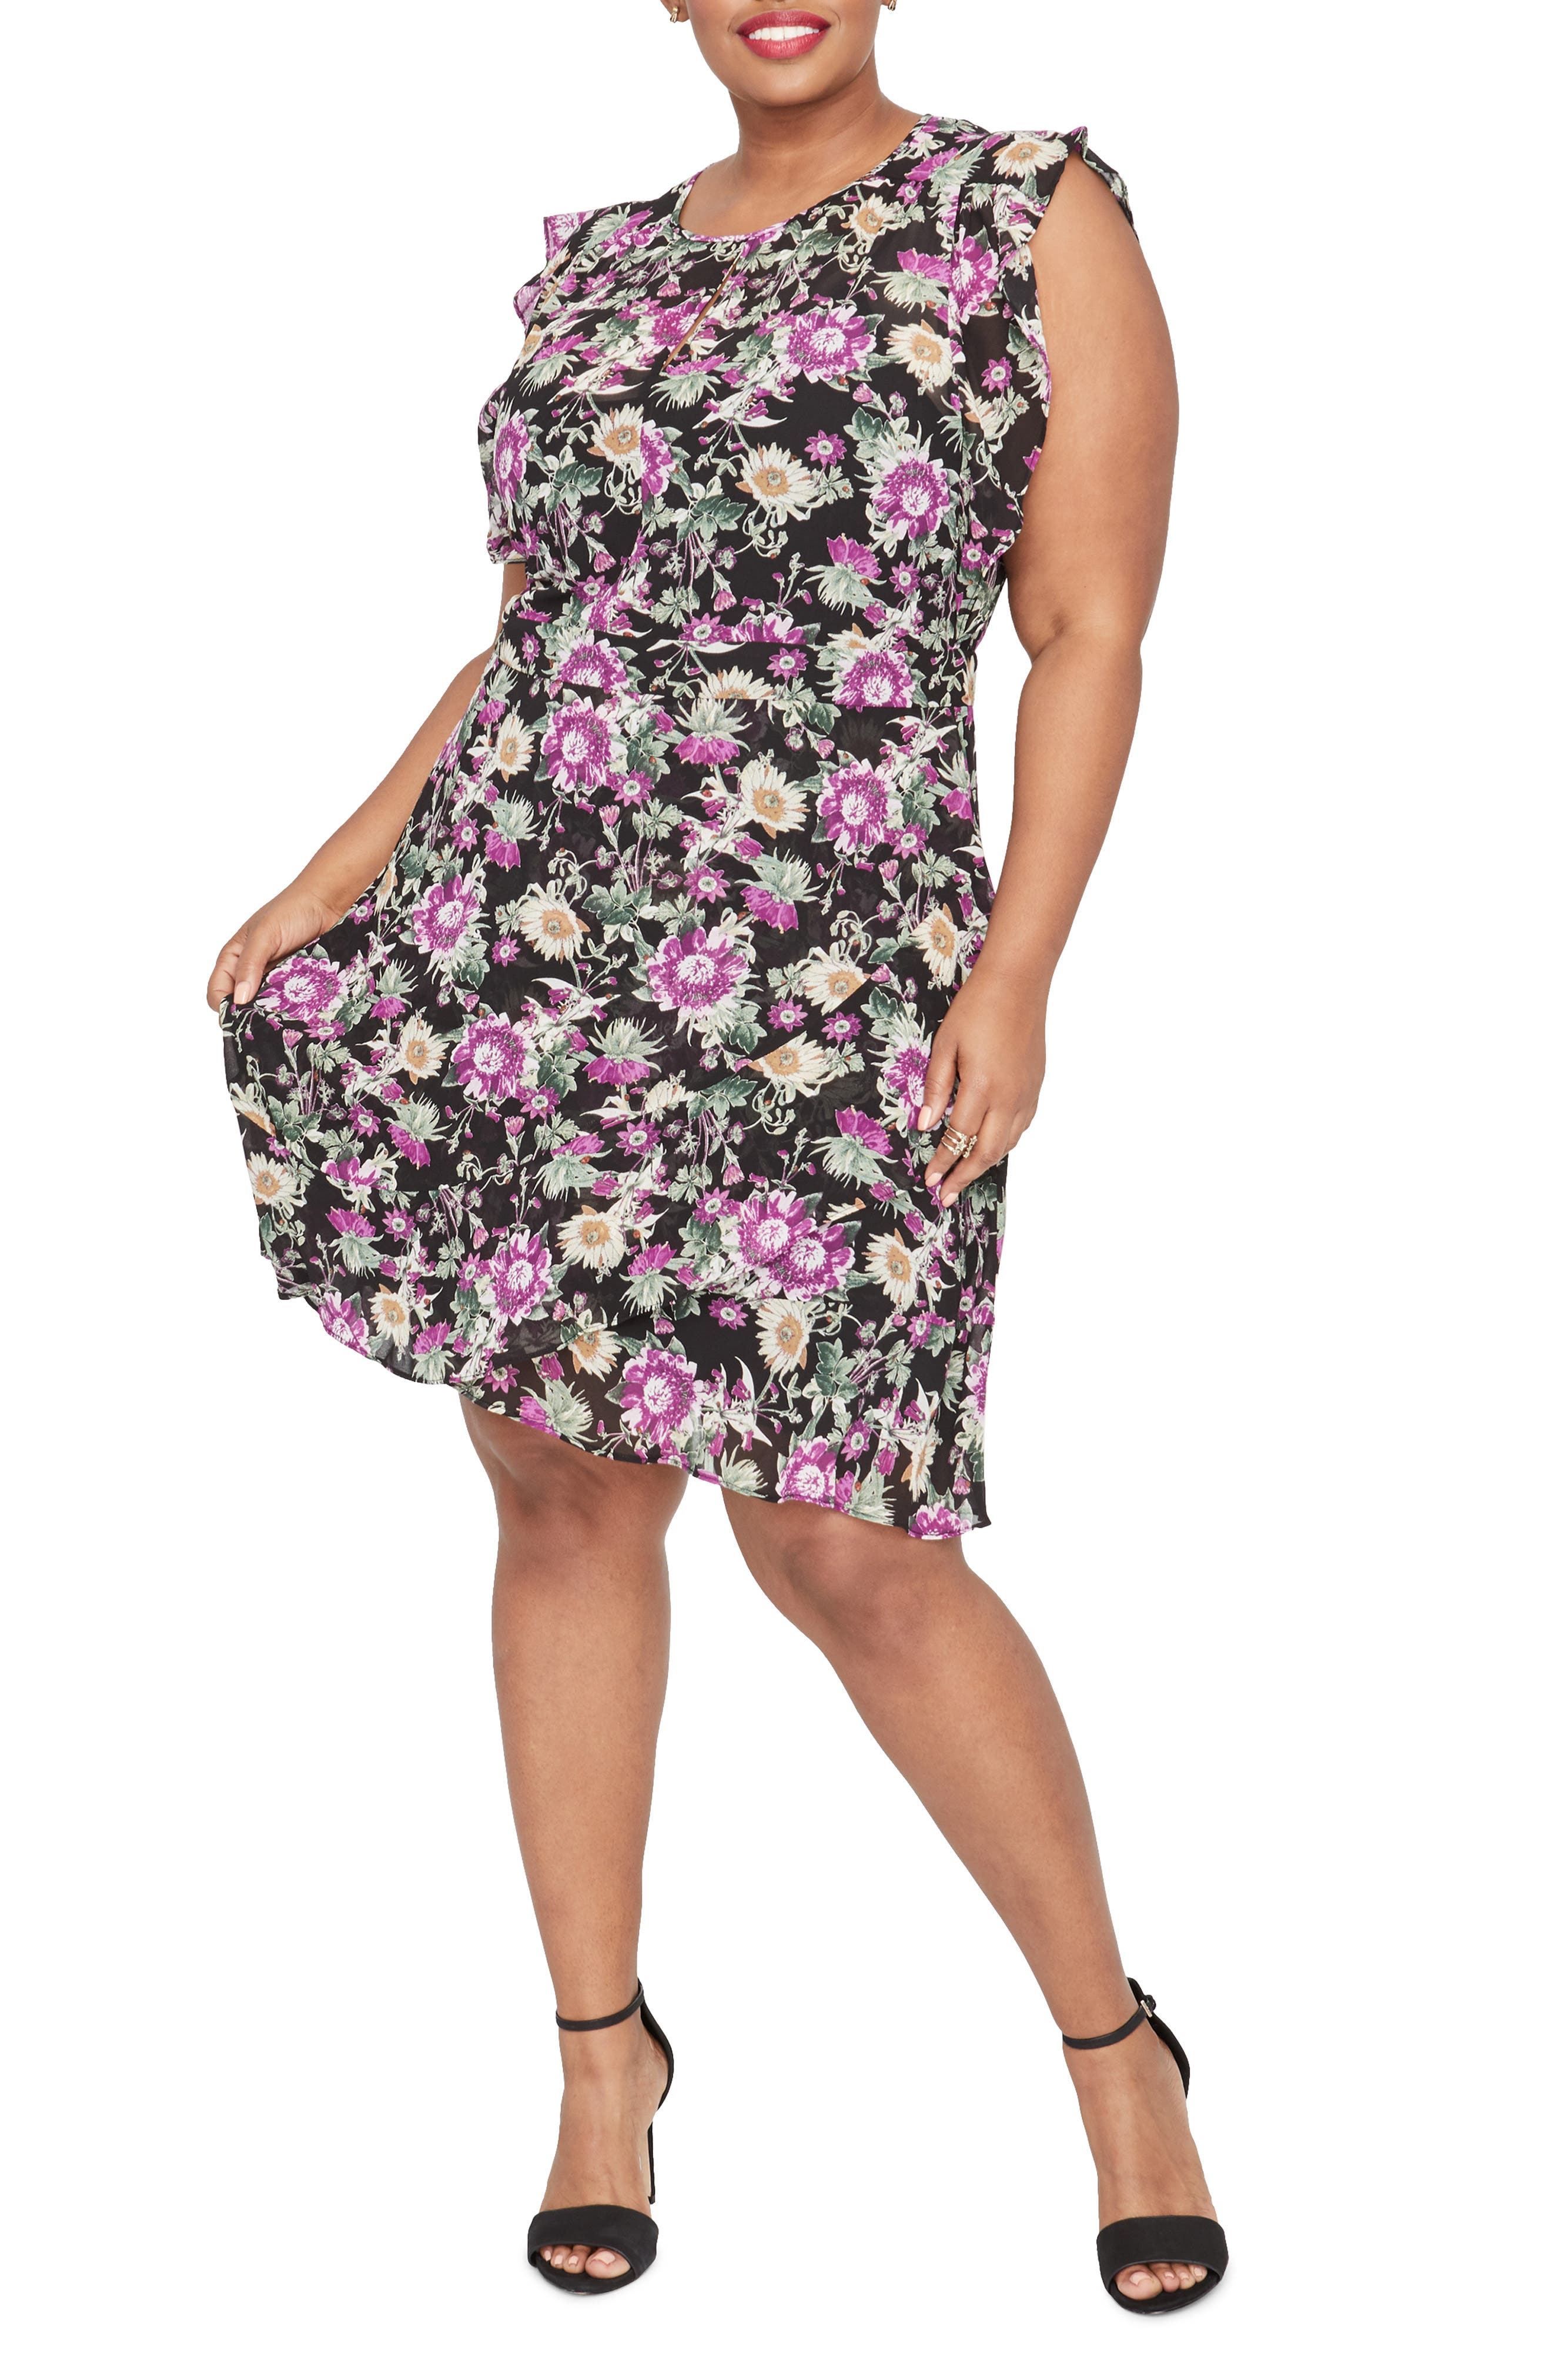 Plus Size Rachel Rachel Roy Lora Dress, Black